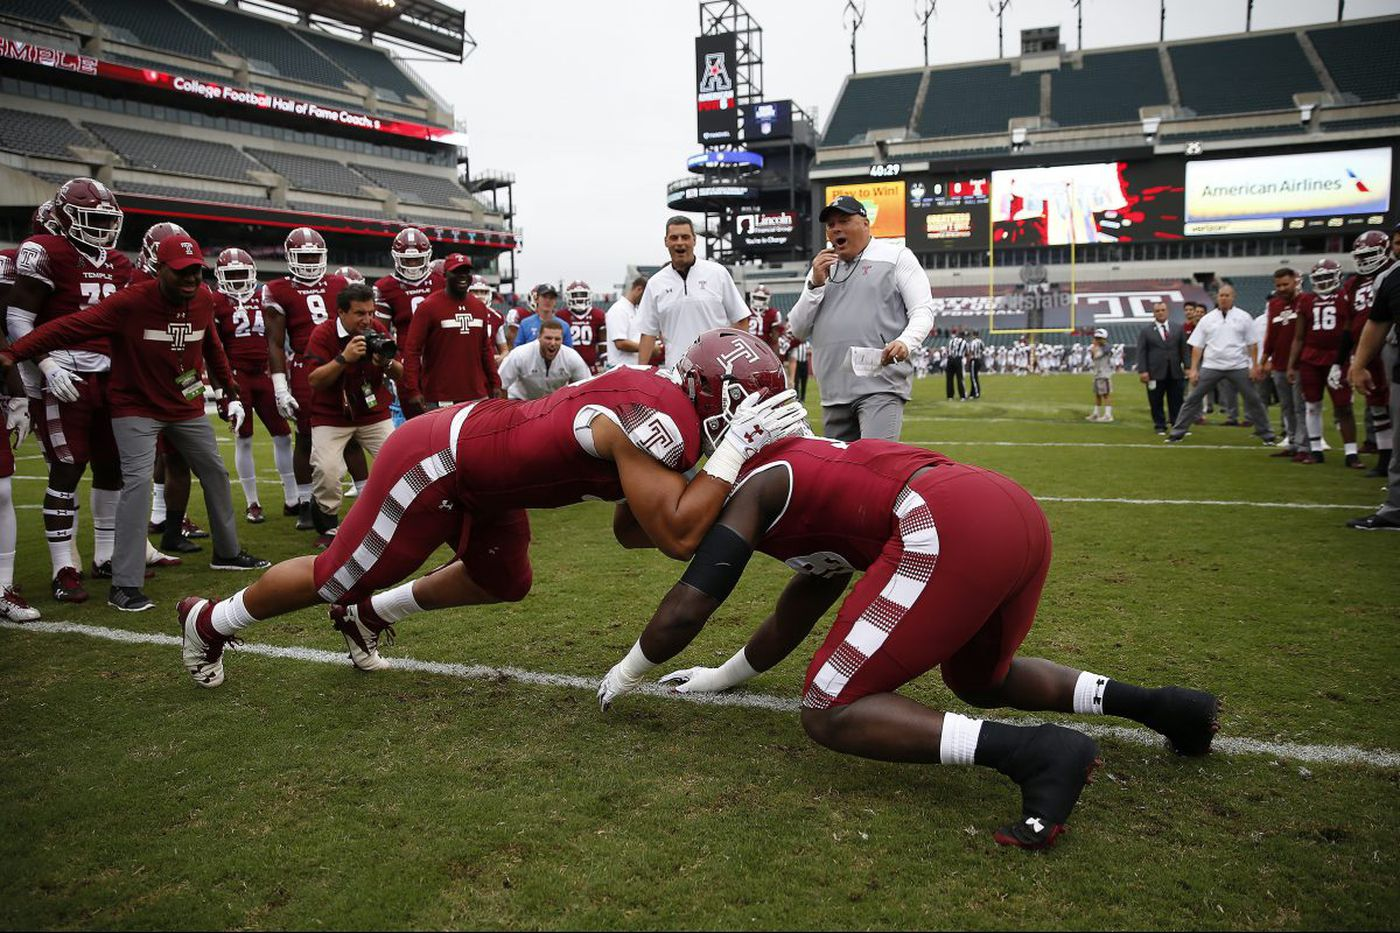 Temple's on-campus football stadium gaining momentum